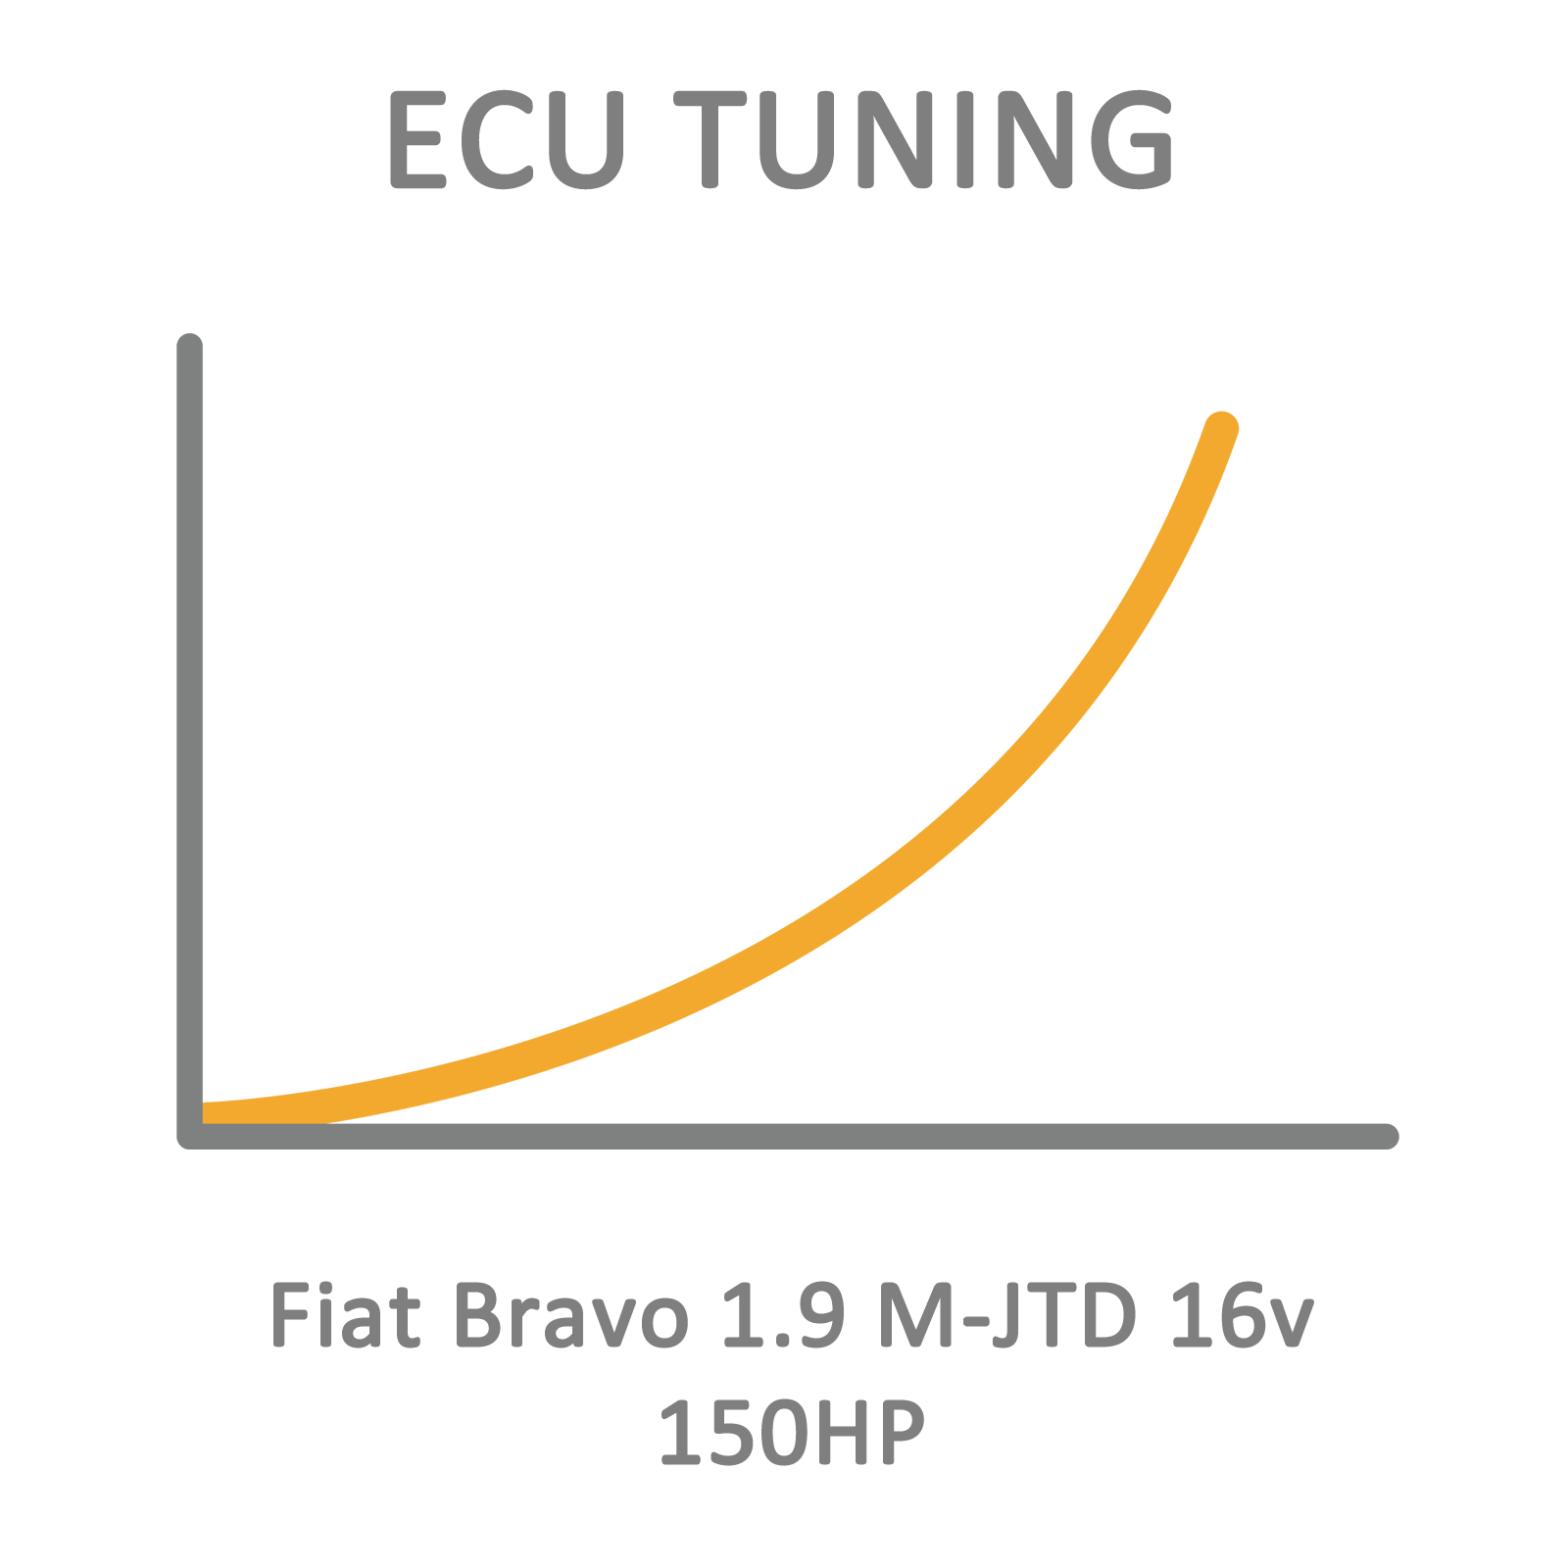 Fiat Bravo 1.9 M-JTD 16v 150HP ECU Tuning Remapping